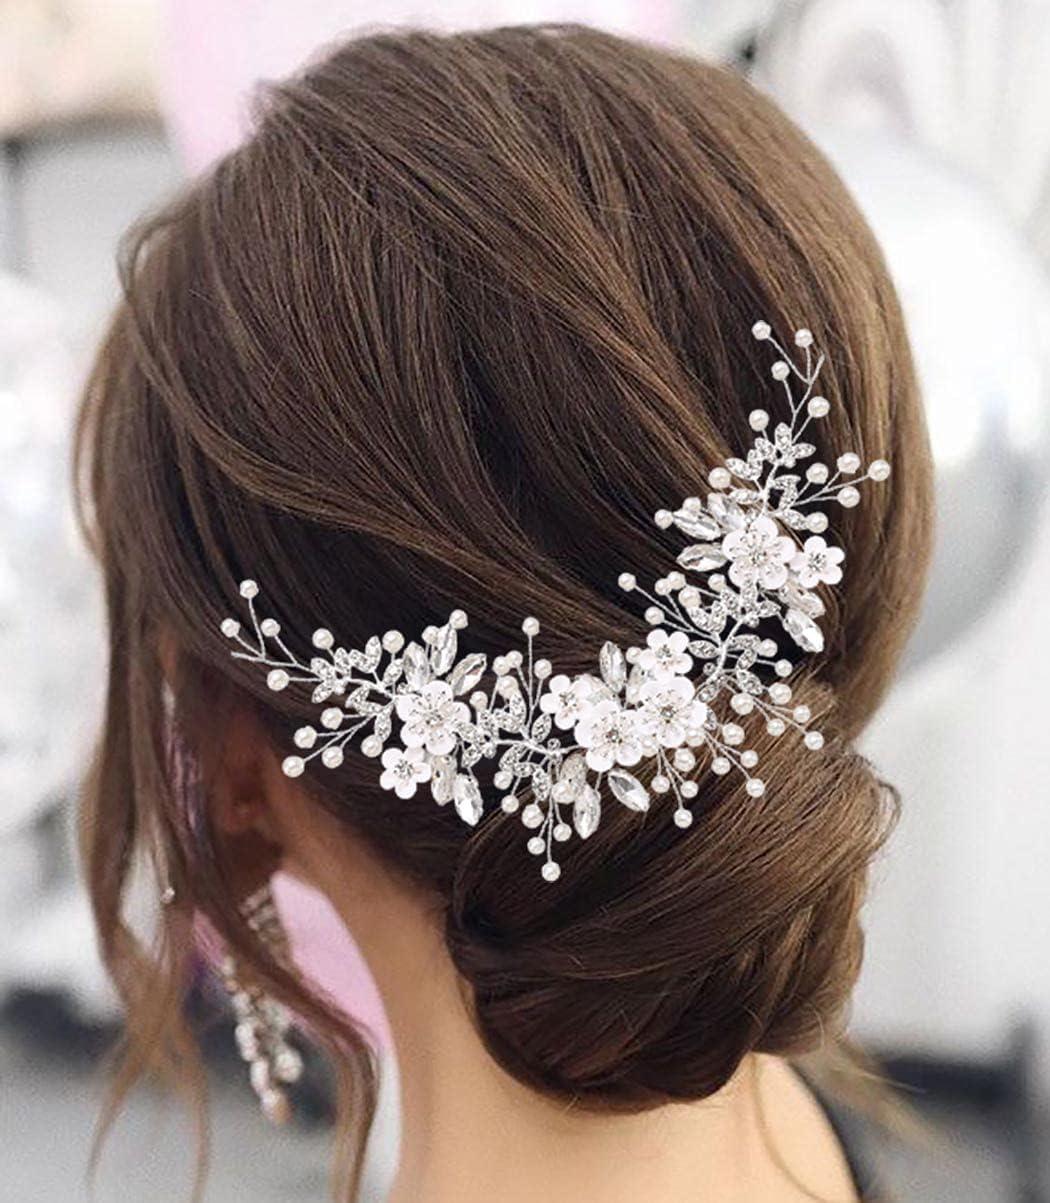 Zoestar Diadema de novia de flores para novia, pelo de vid de plata con cristales de cristal para novia, pieza de pelo de hoja para mujeres y niñas